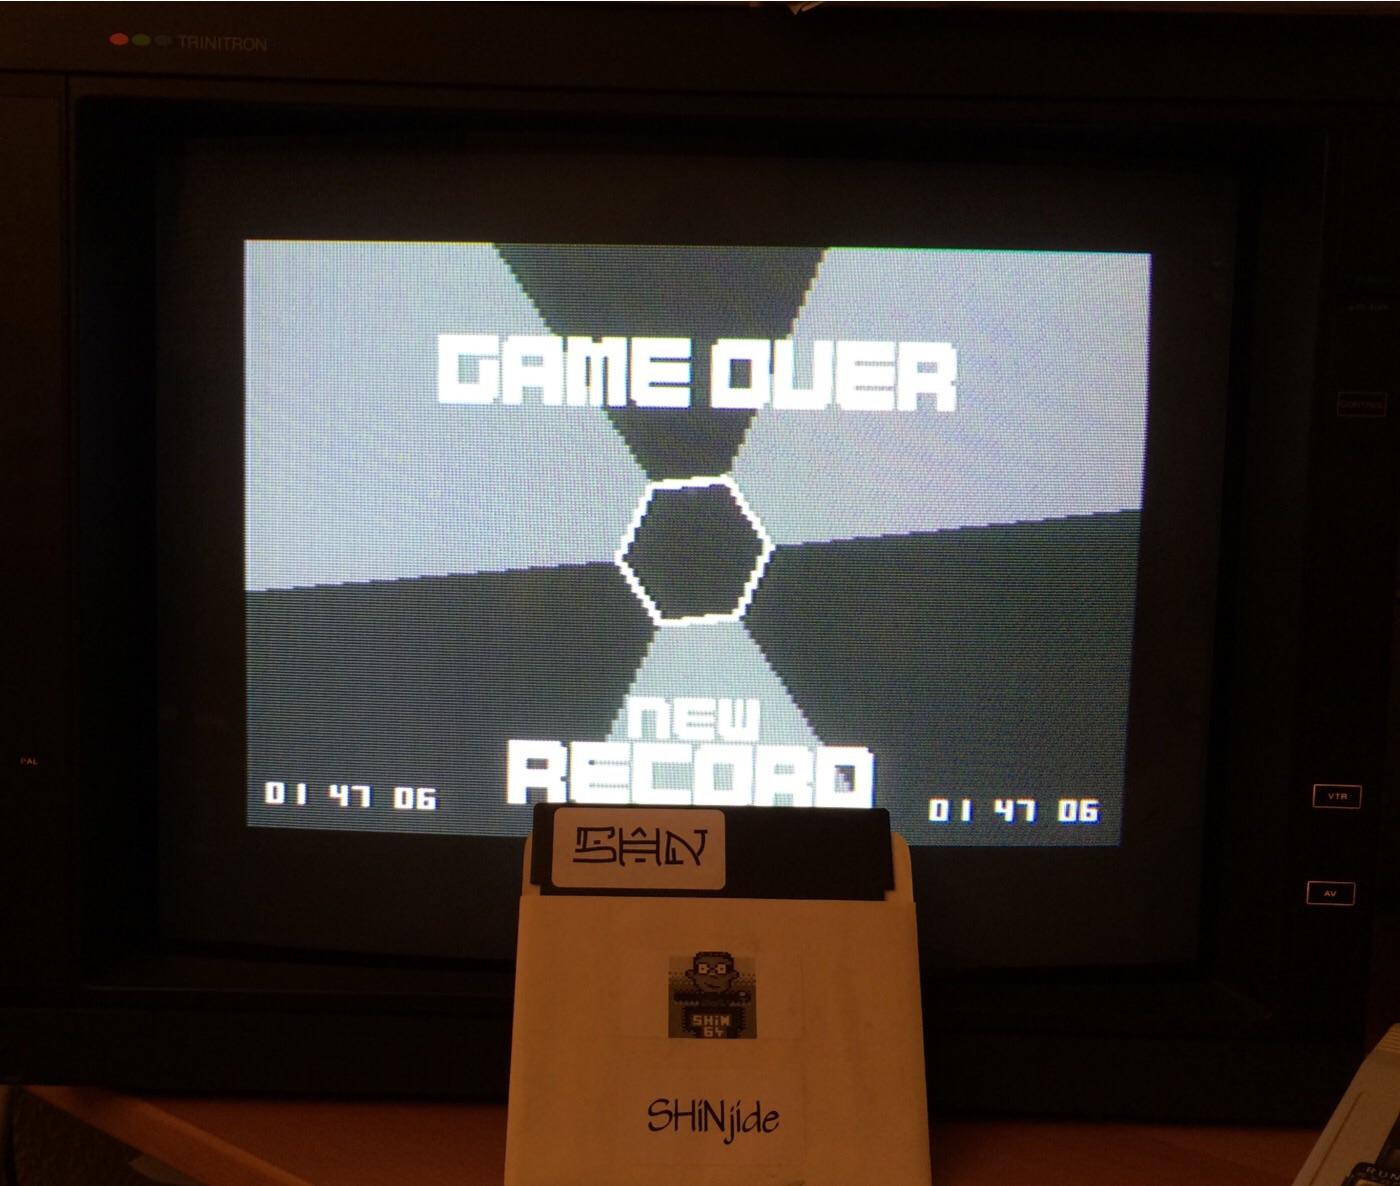 SHiNjide: Micro Hexagon (Commodore 64) 0:01:47.06 points on 2014-10-12 14:02:33